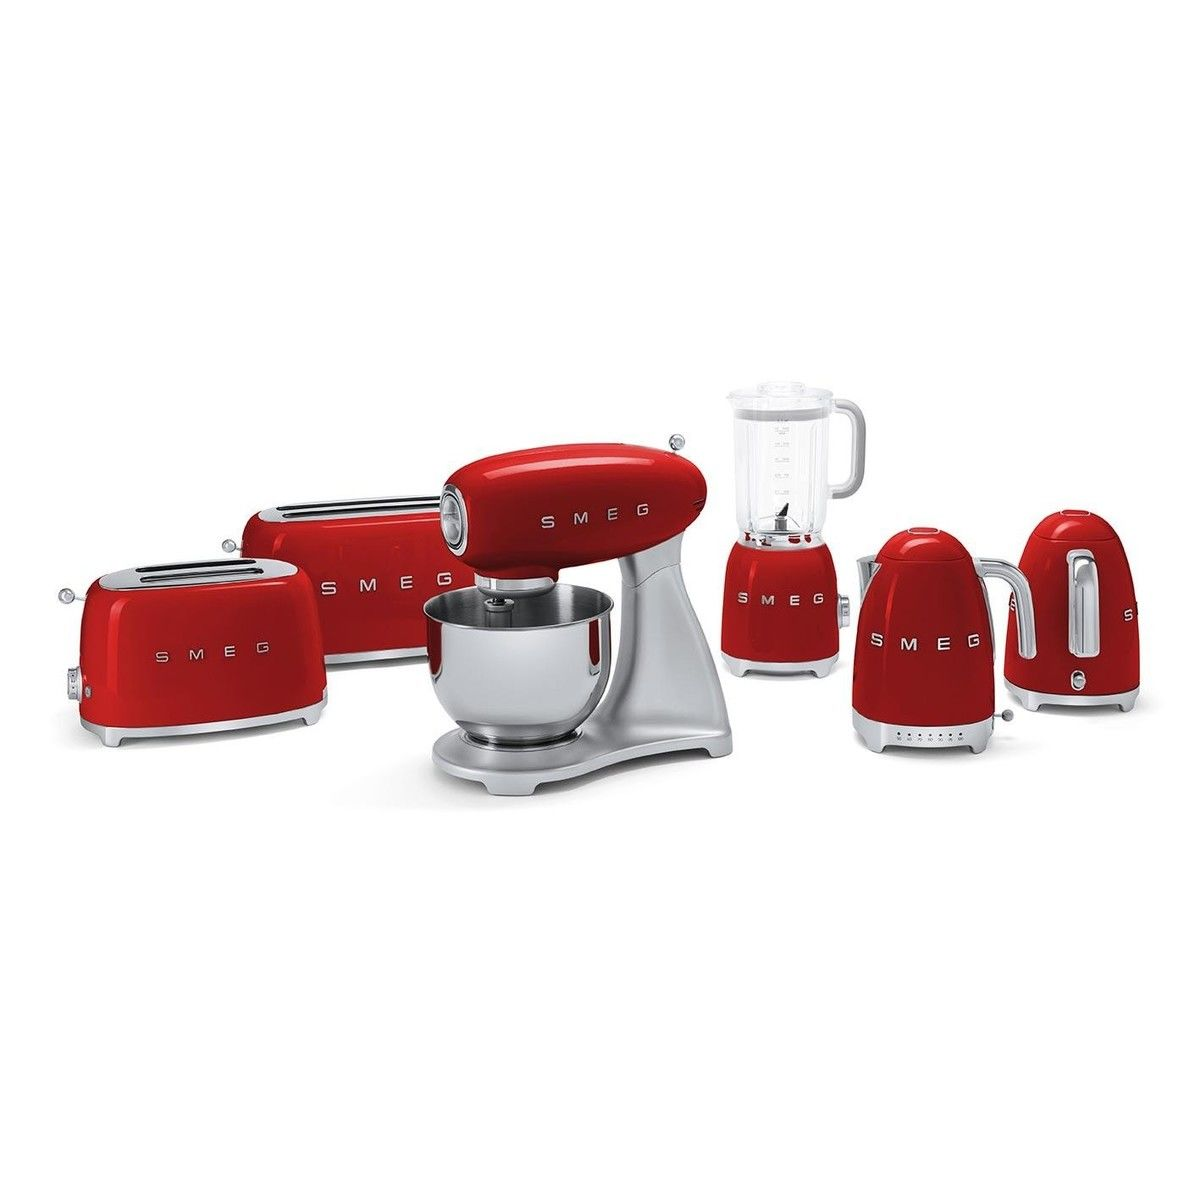 Red Retro Kitchen Accessories Smeg Klf01 Kettle 17l Smeg Ambientedirectcom